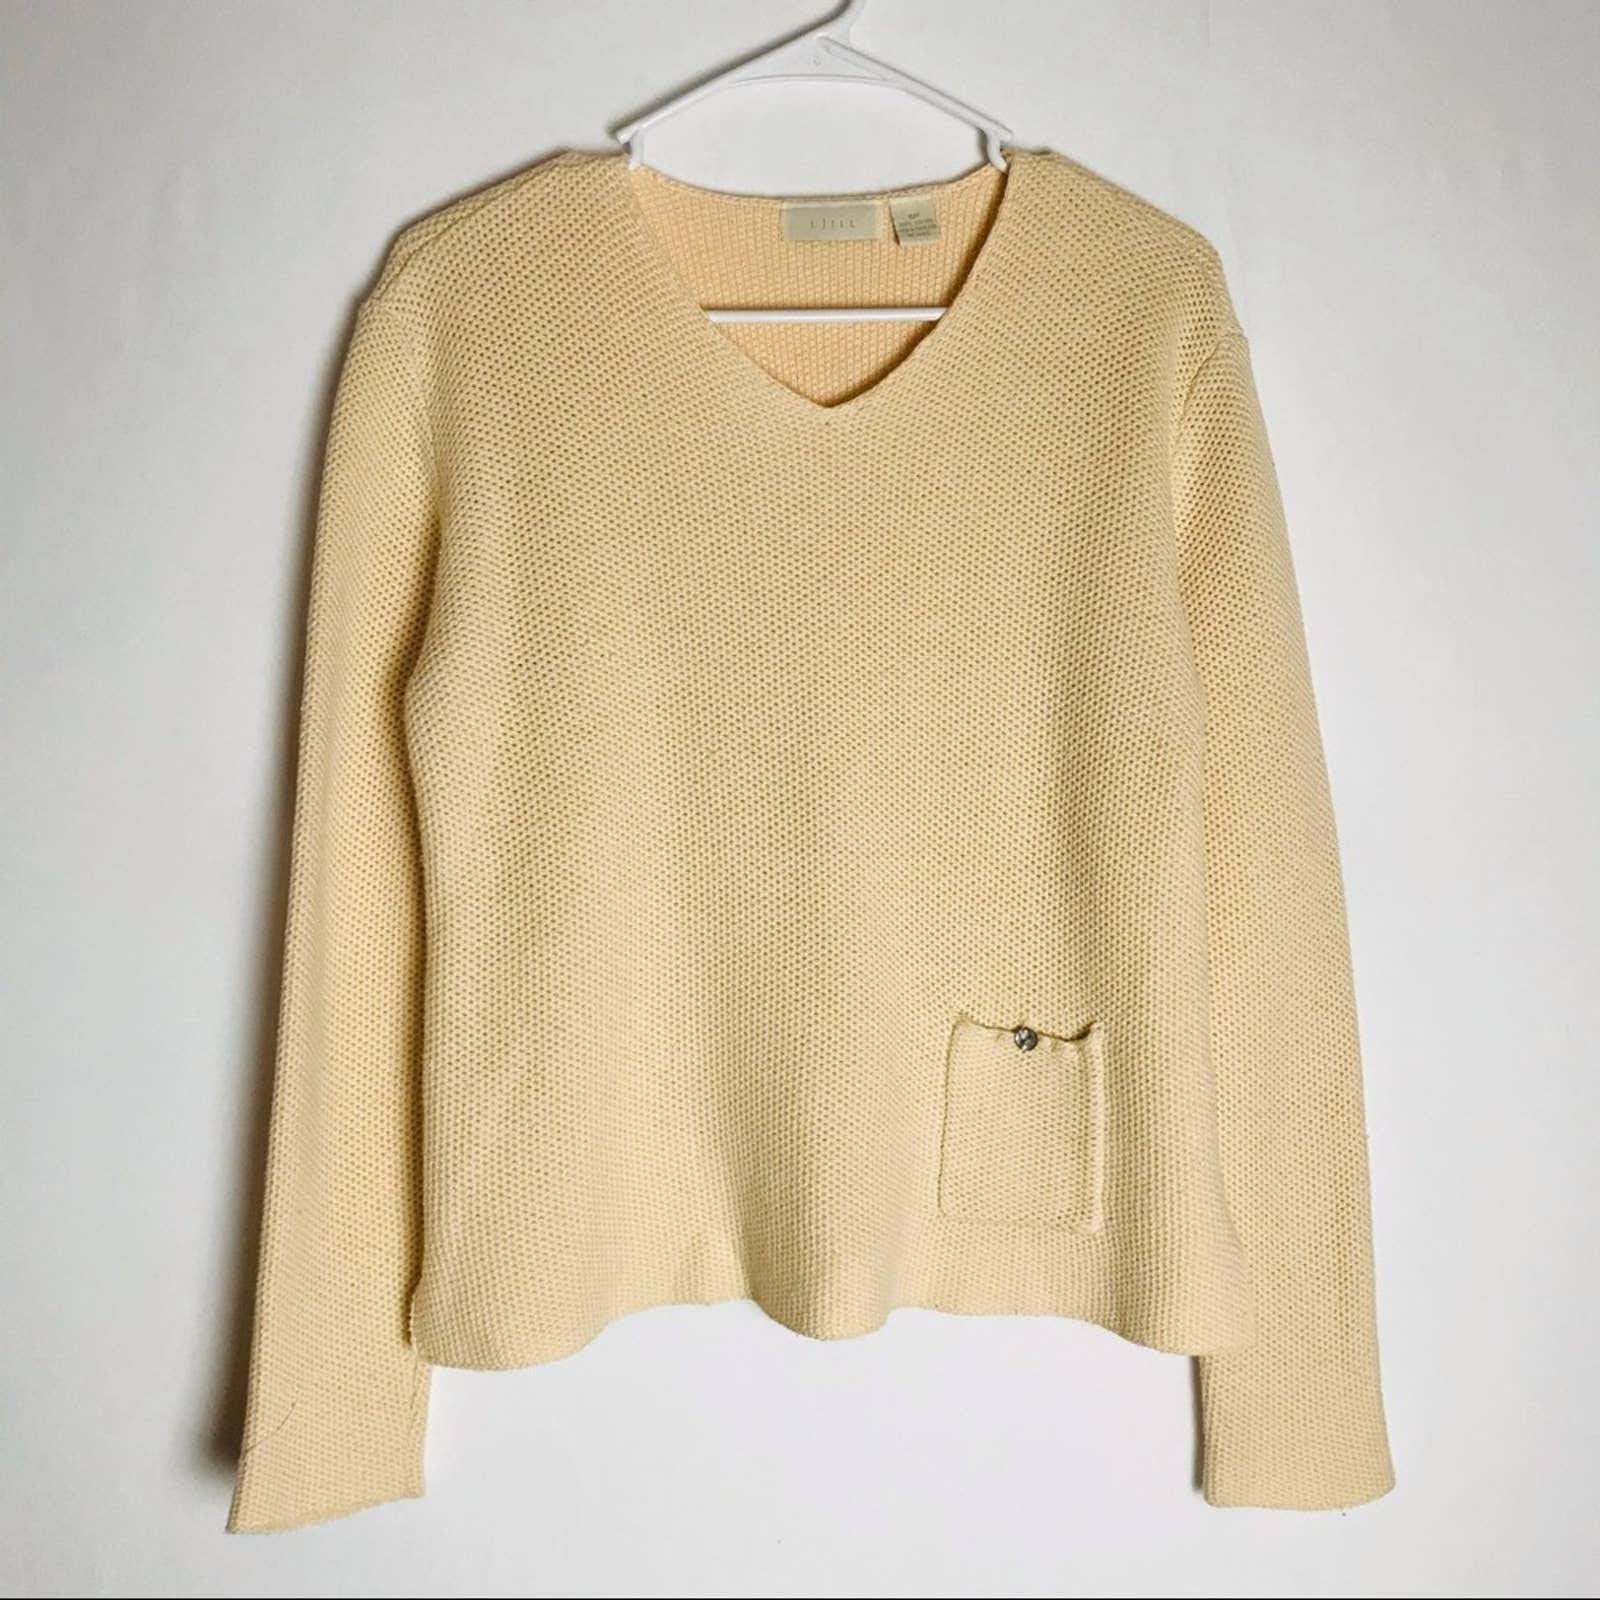 J JILL Cream Color Knit V Neck Sweater